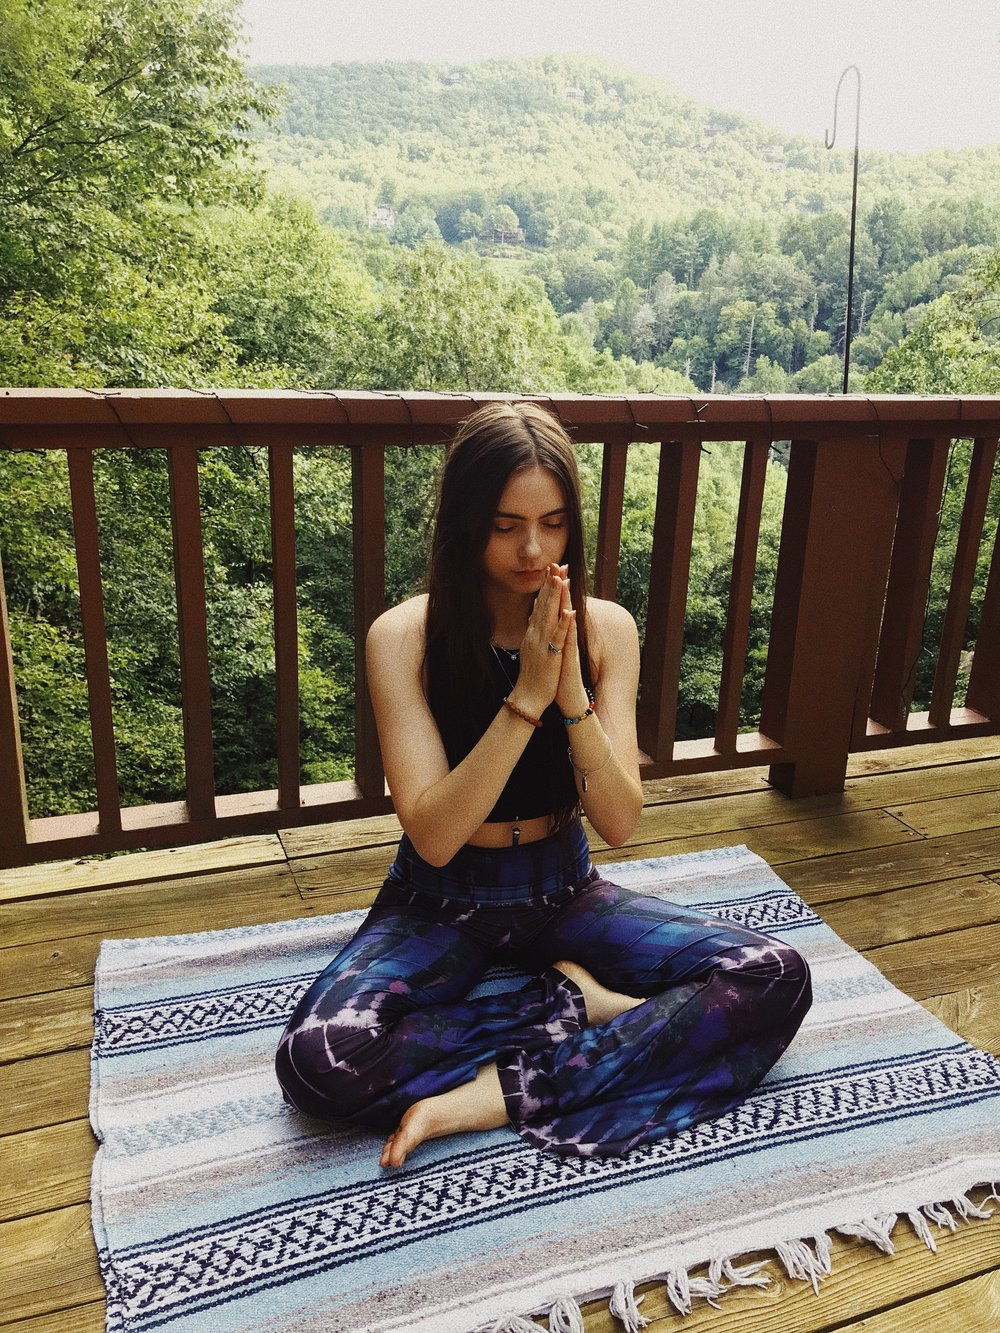 morning routine, easy morning routine, holistic health, holistic wellness, health blog, yoga blog, wellness blog, chronic illness, recovery, natural remedies, spoonies, meditation, meditation for beginners, mindfulness, mindfulness tips, easy yoga routine, yoga for beginners